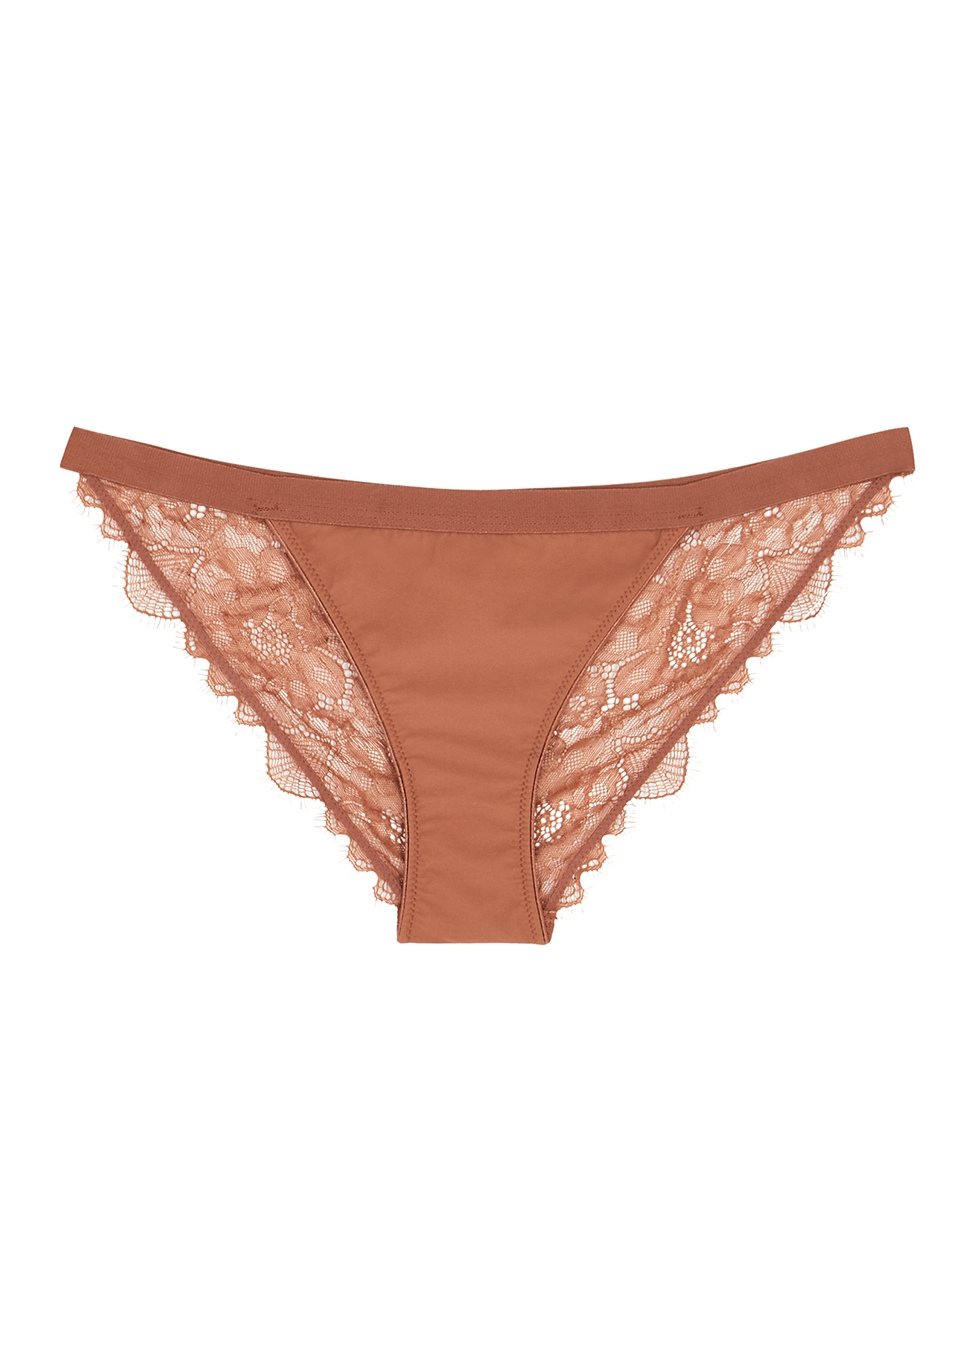 Wild Rose brown lace briefs